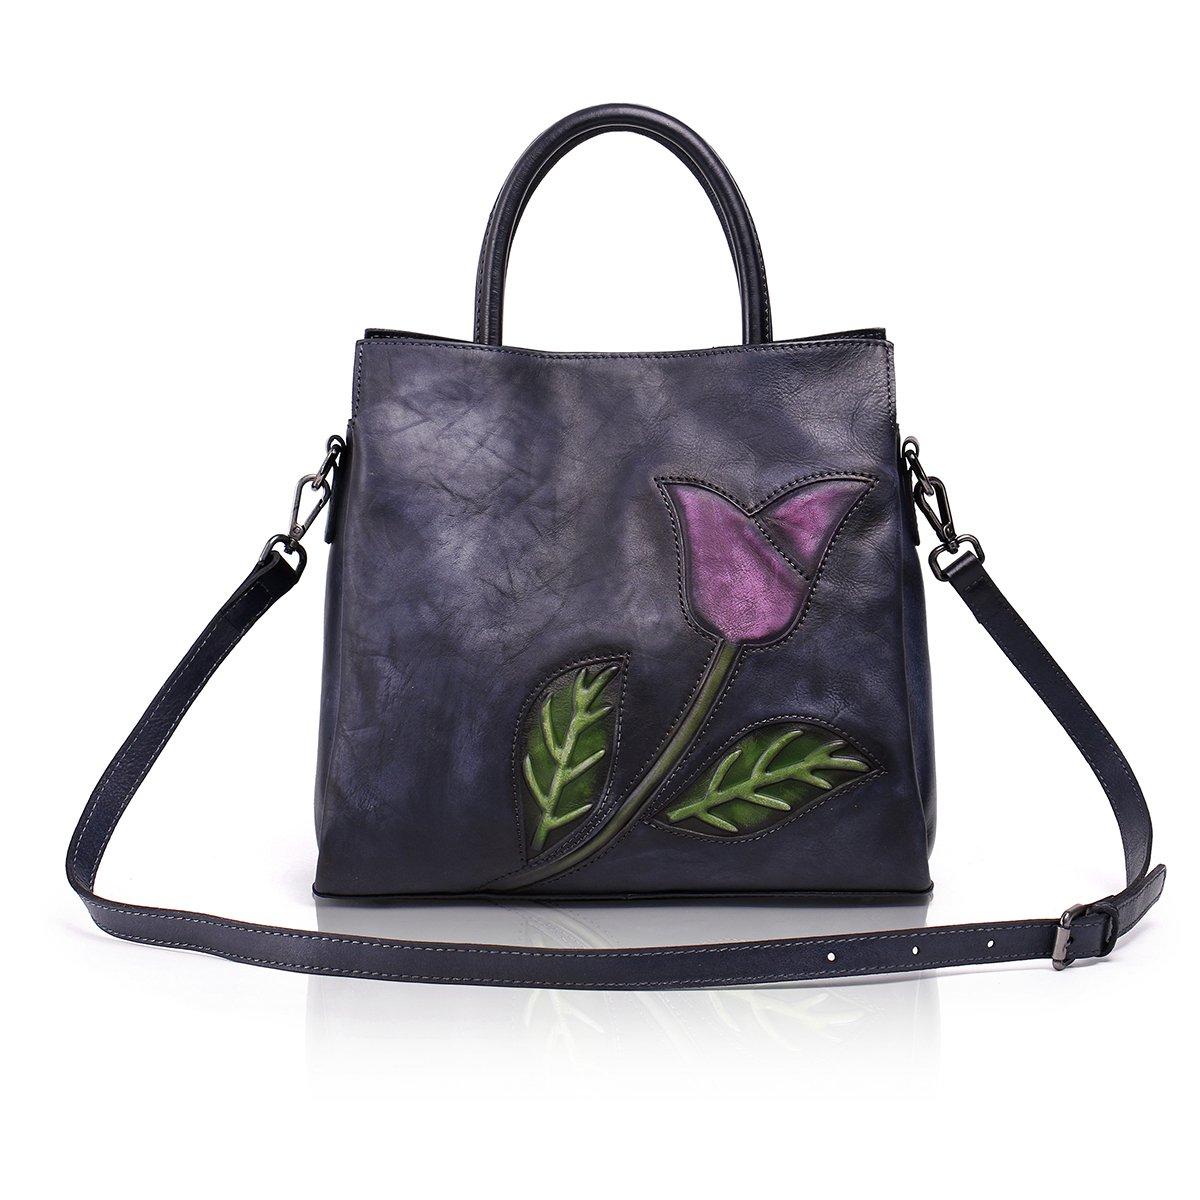 Aphison Designer Soft Leather Totes Handbags for Women, Ladies Satchels Shoulder Bags (BLACK) by APHISON (Image #2)